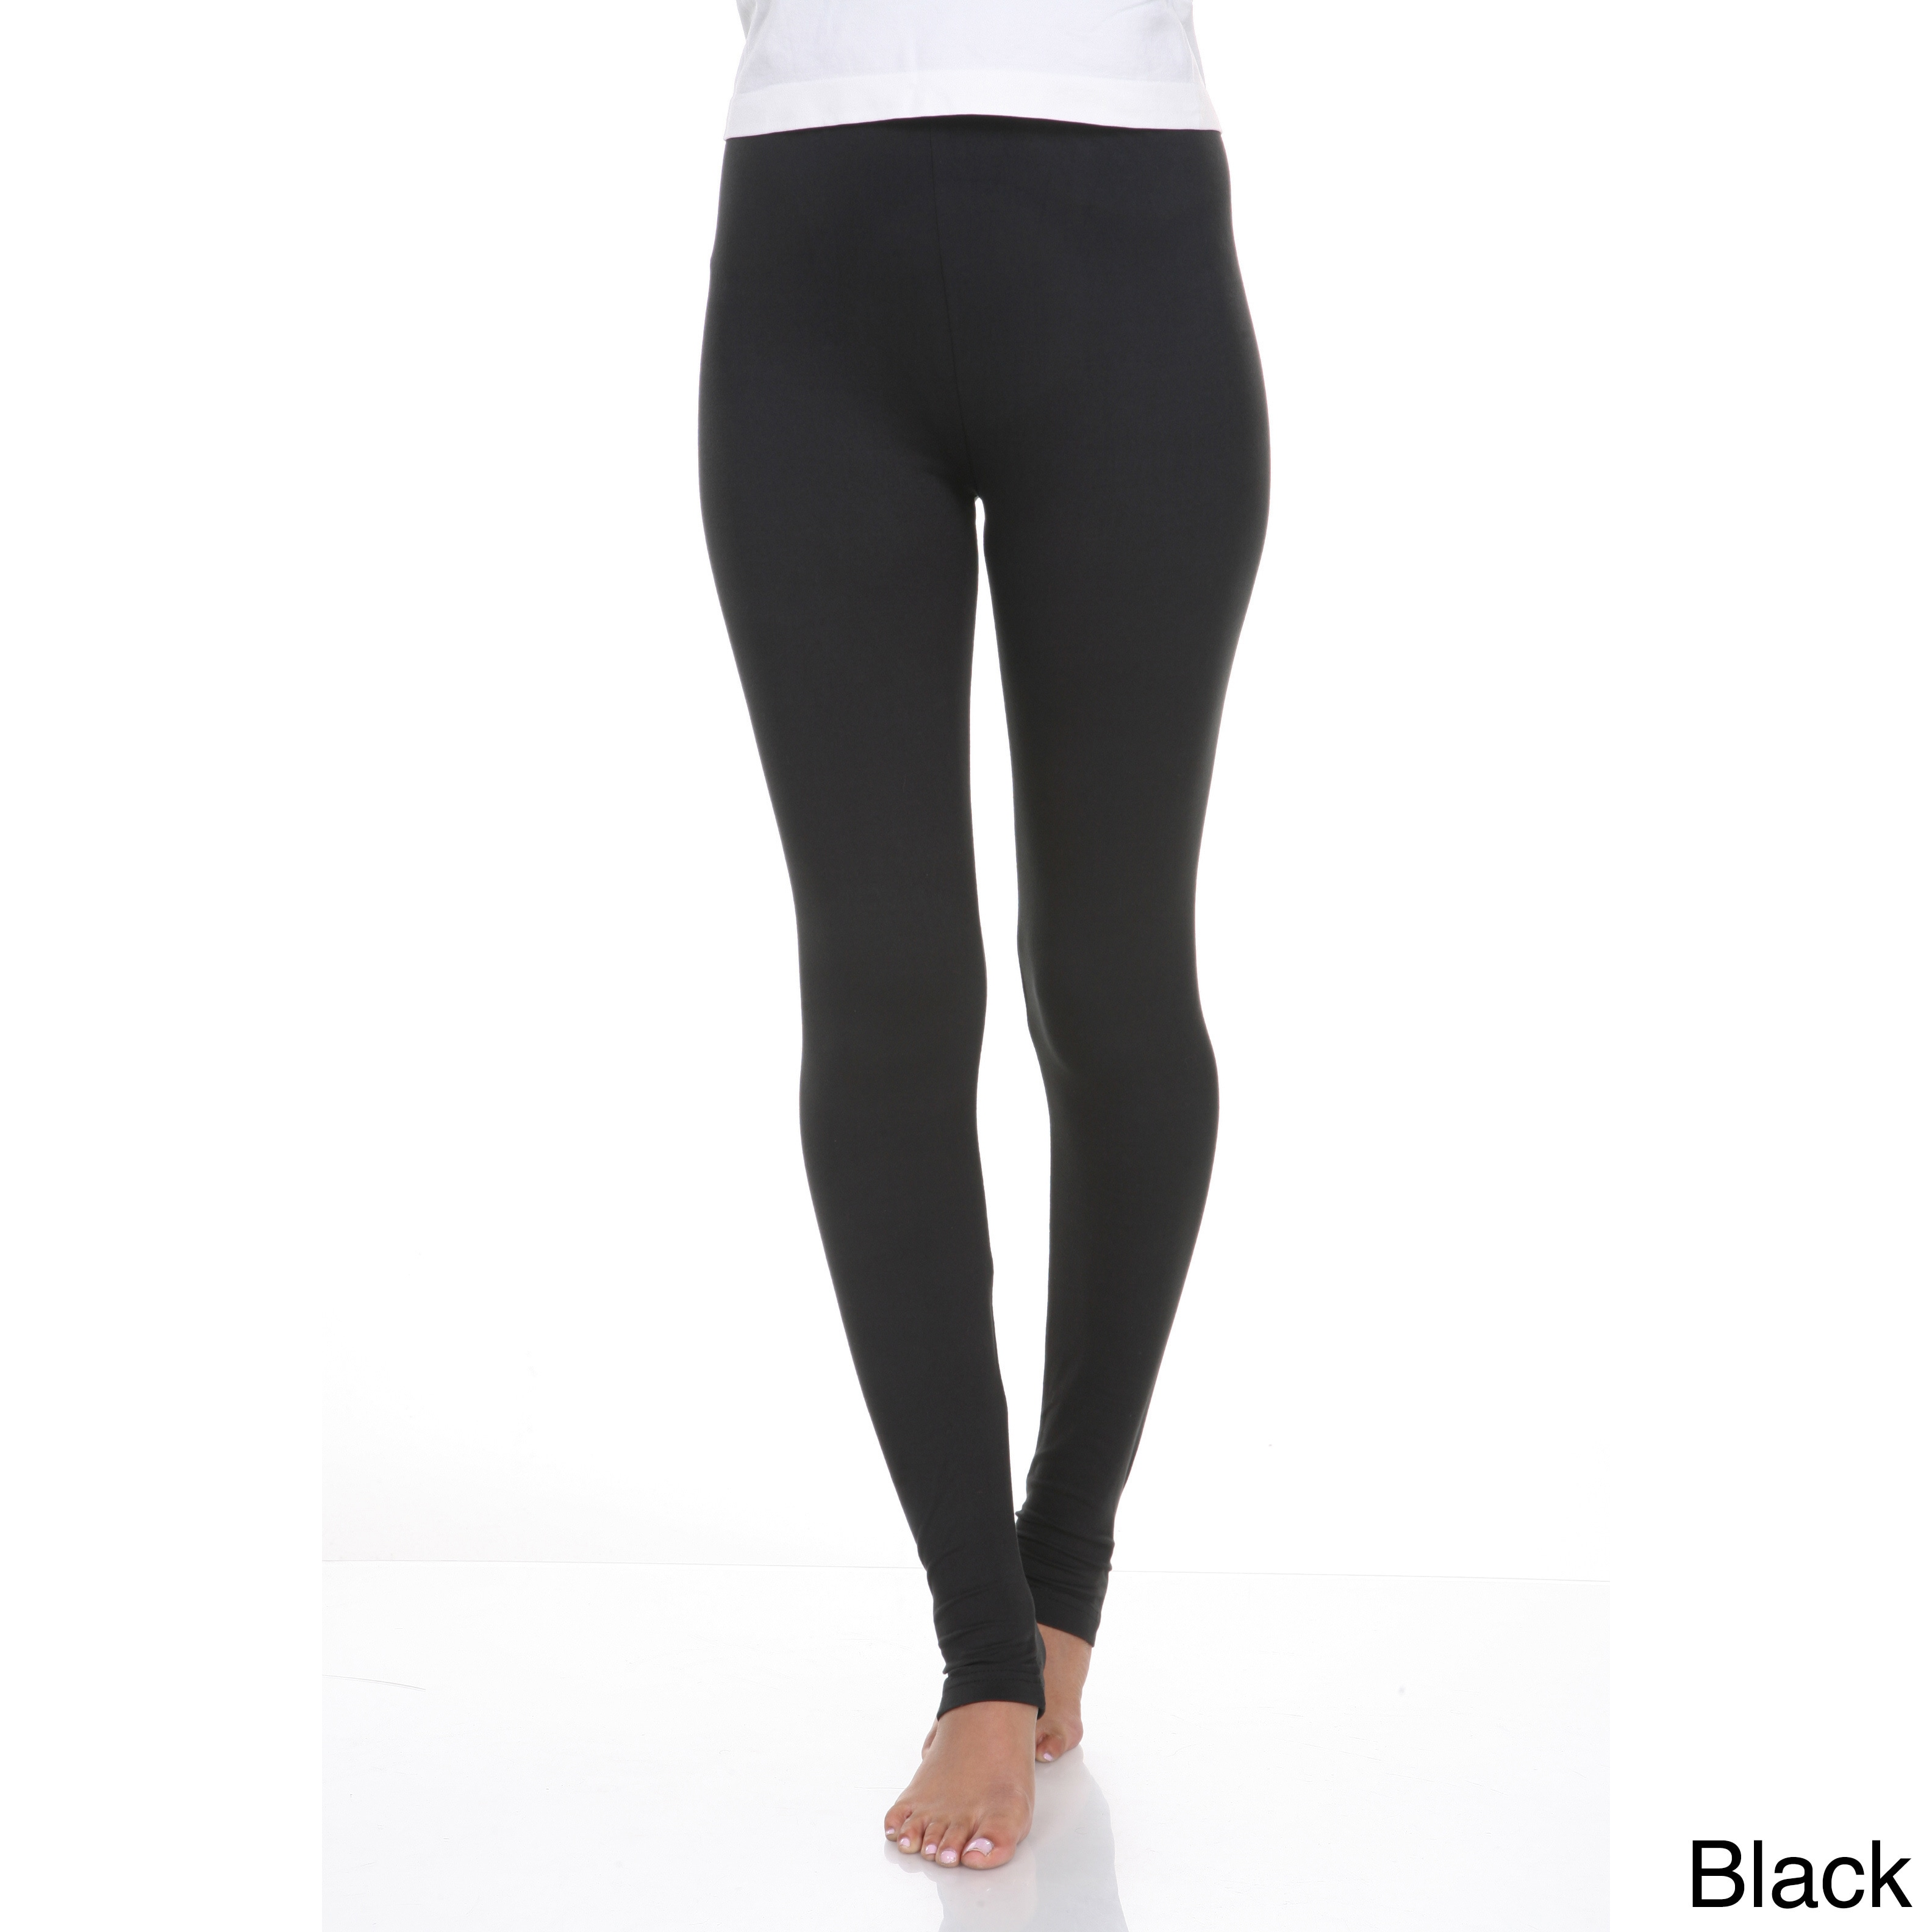 54c5ab4c90ca6 Shop White Mark Women's Cotton Leggings - Free Shipping On Orders ...